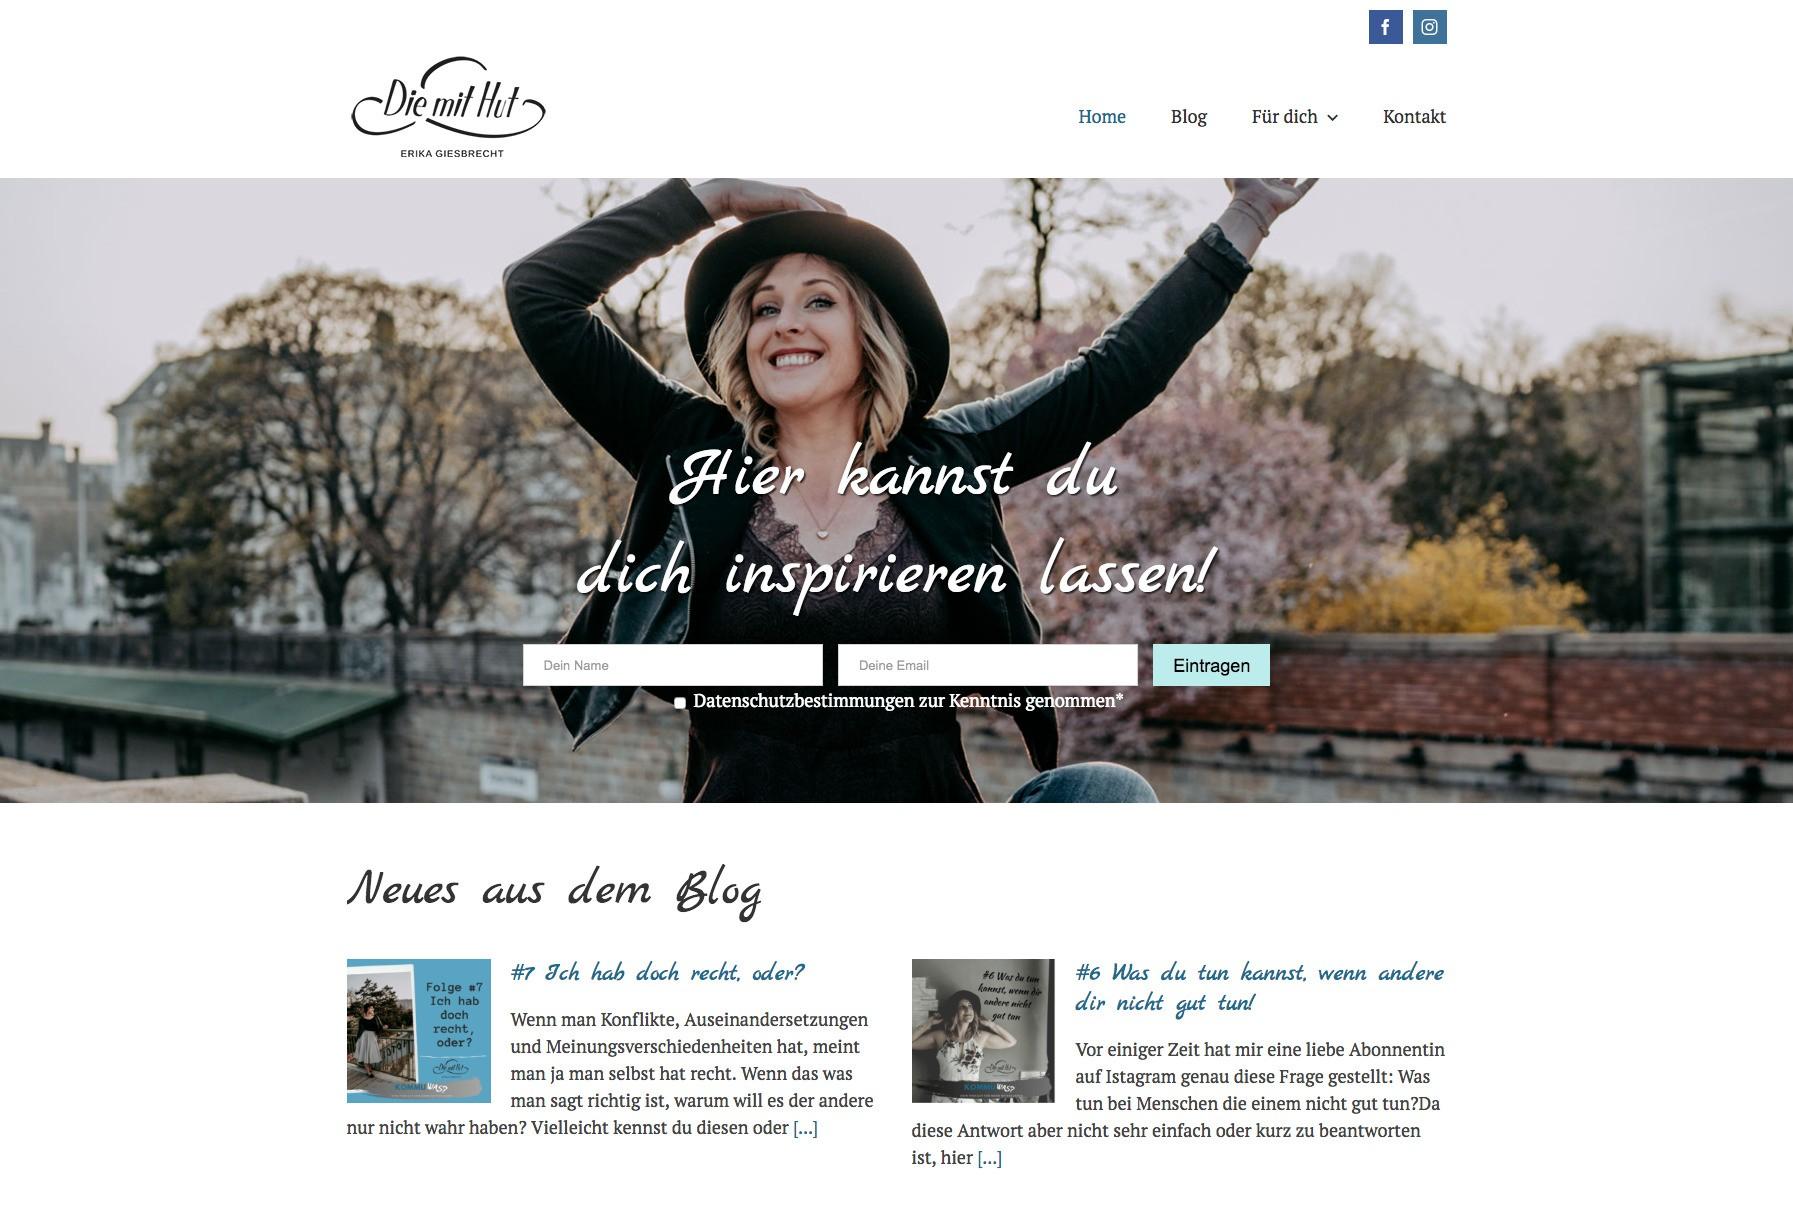 diemithut.com 1